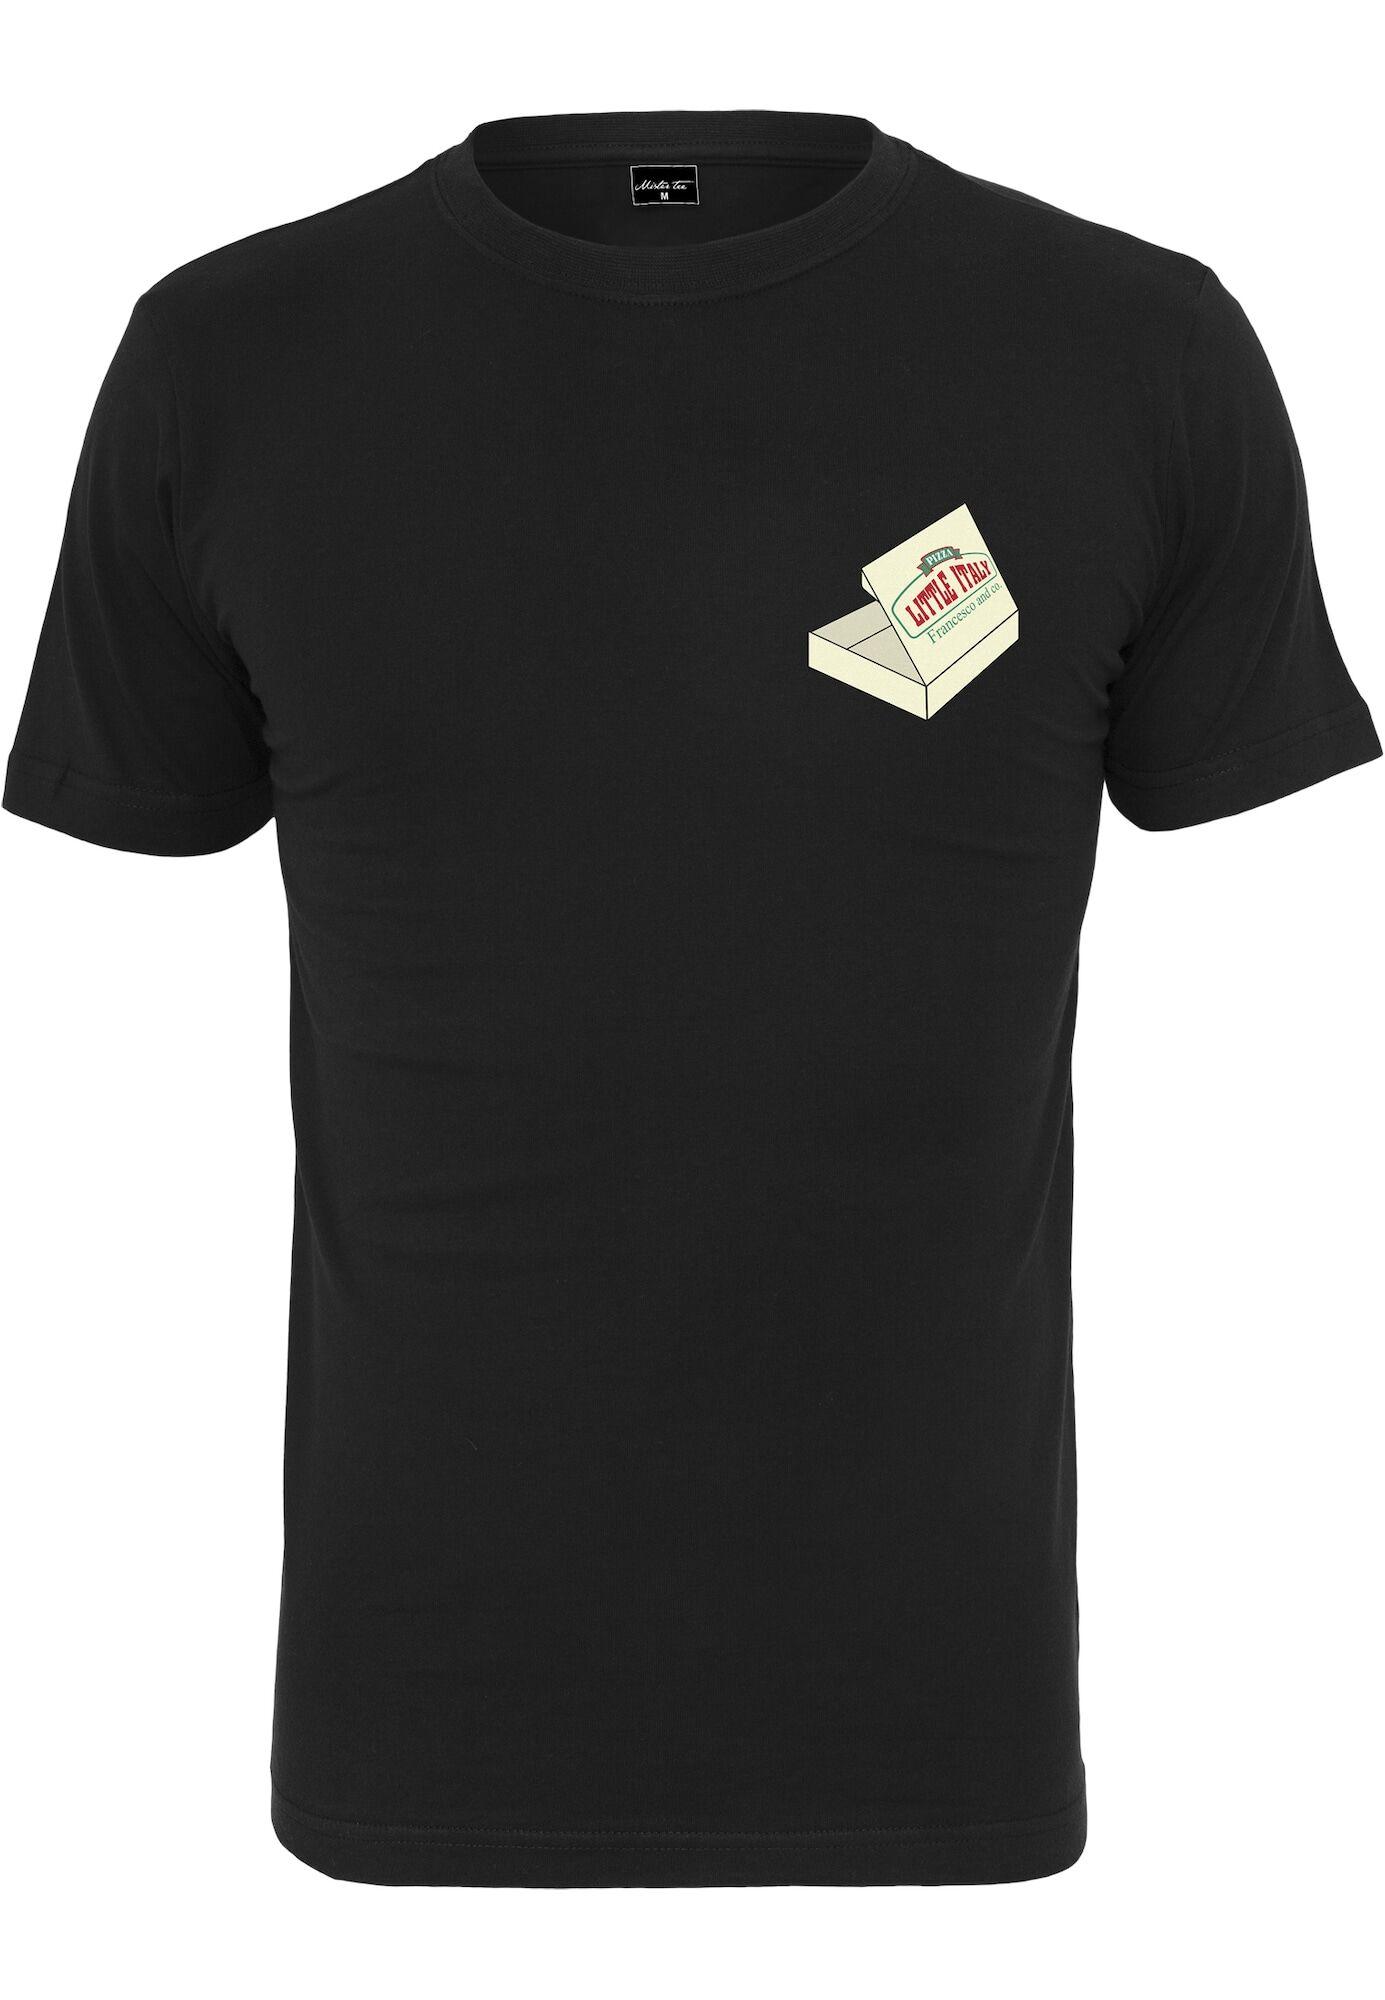 Tee T-Shirt 'Pizza Francesco'  - Noir - Taille: XL - male